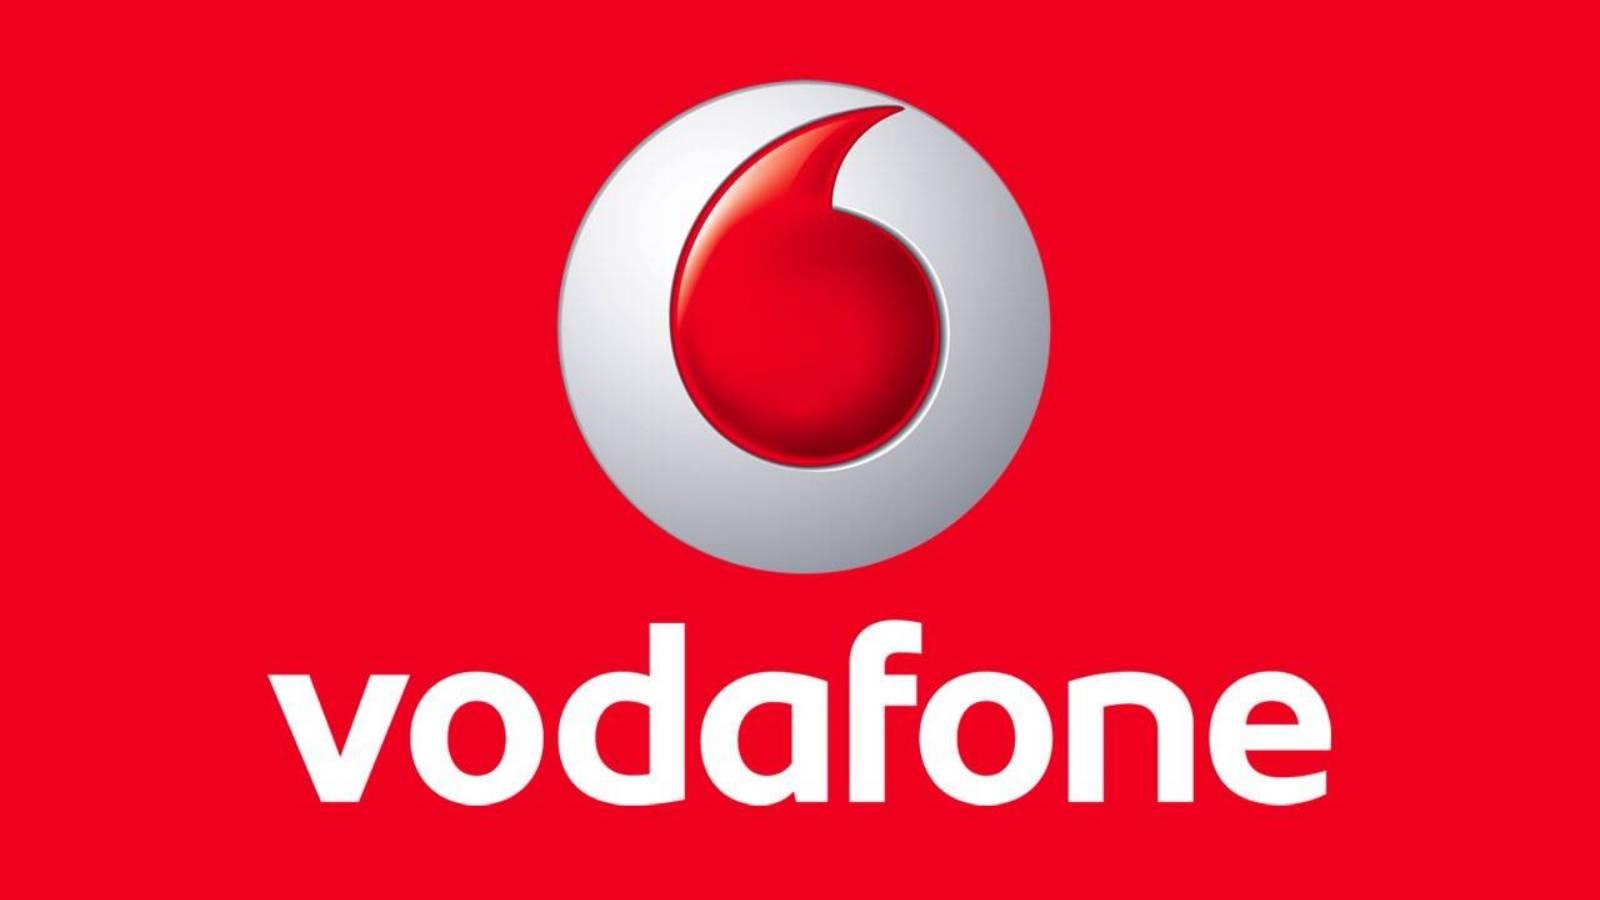 Vodafone raspunsuri